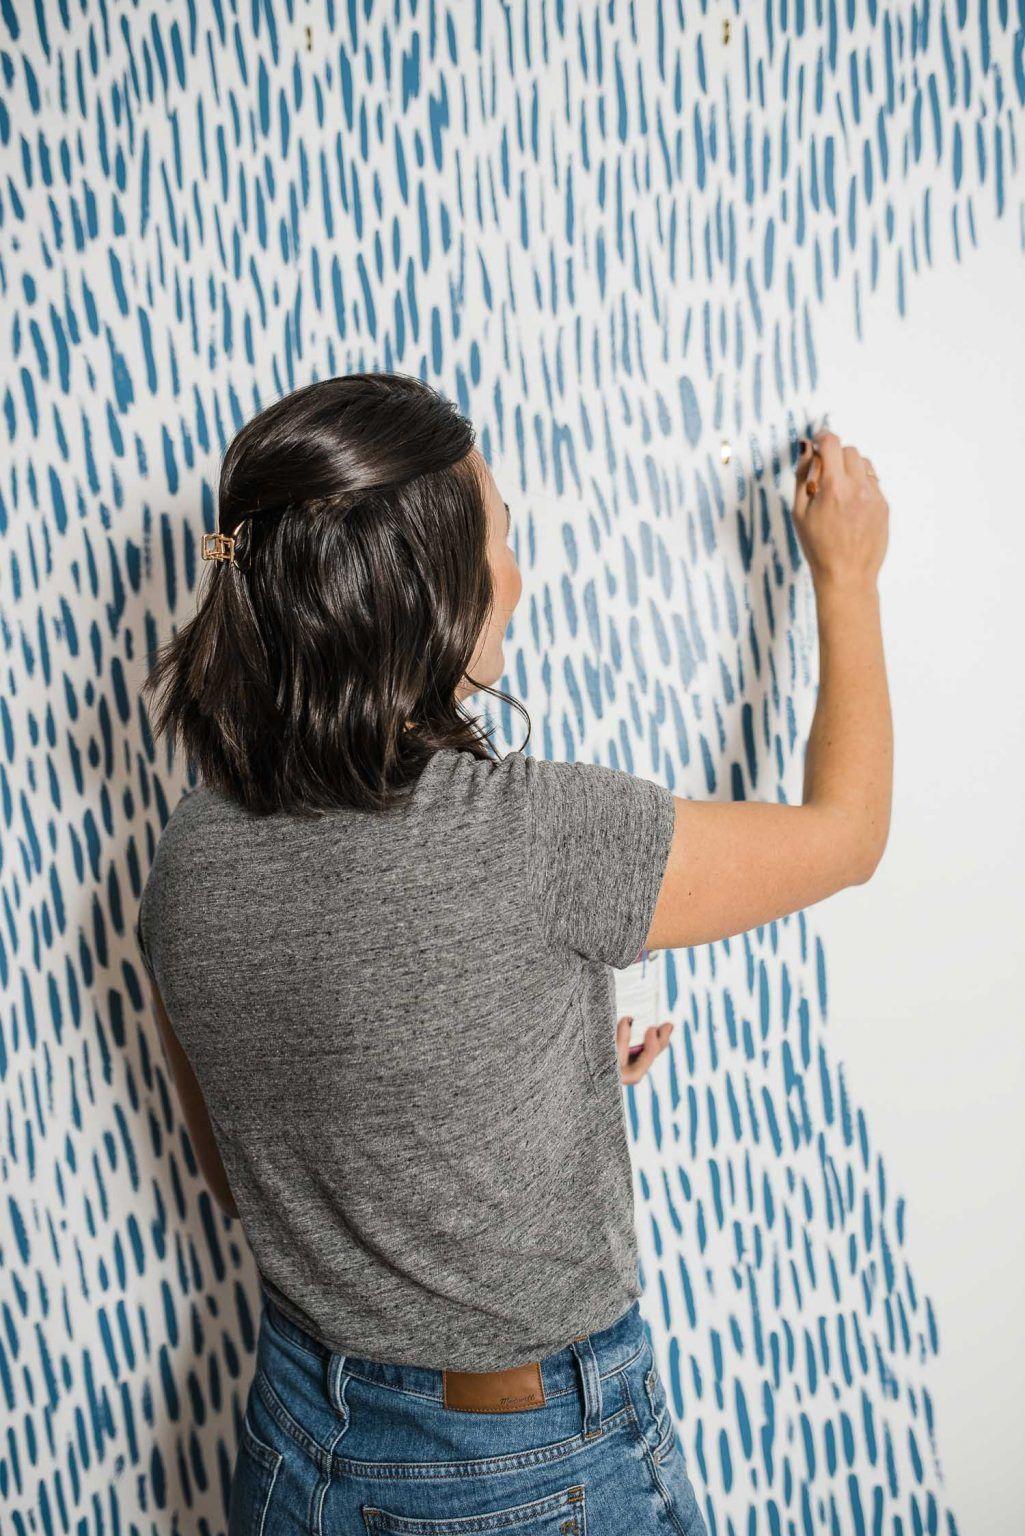 Diy Brushstroke Accent Wall Tutorial Diy Accent Wall Accent Wall Nursery Accent Wall